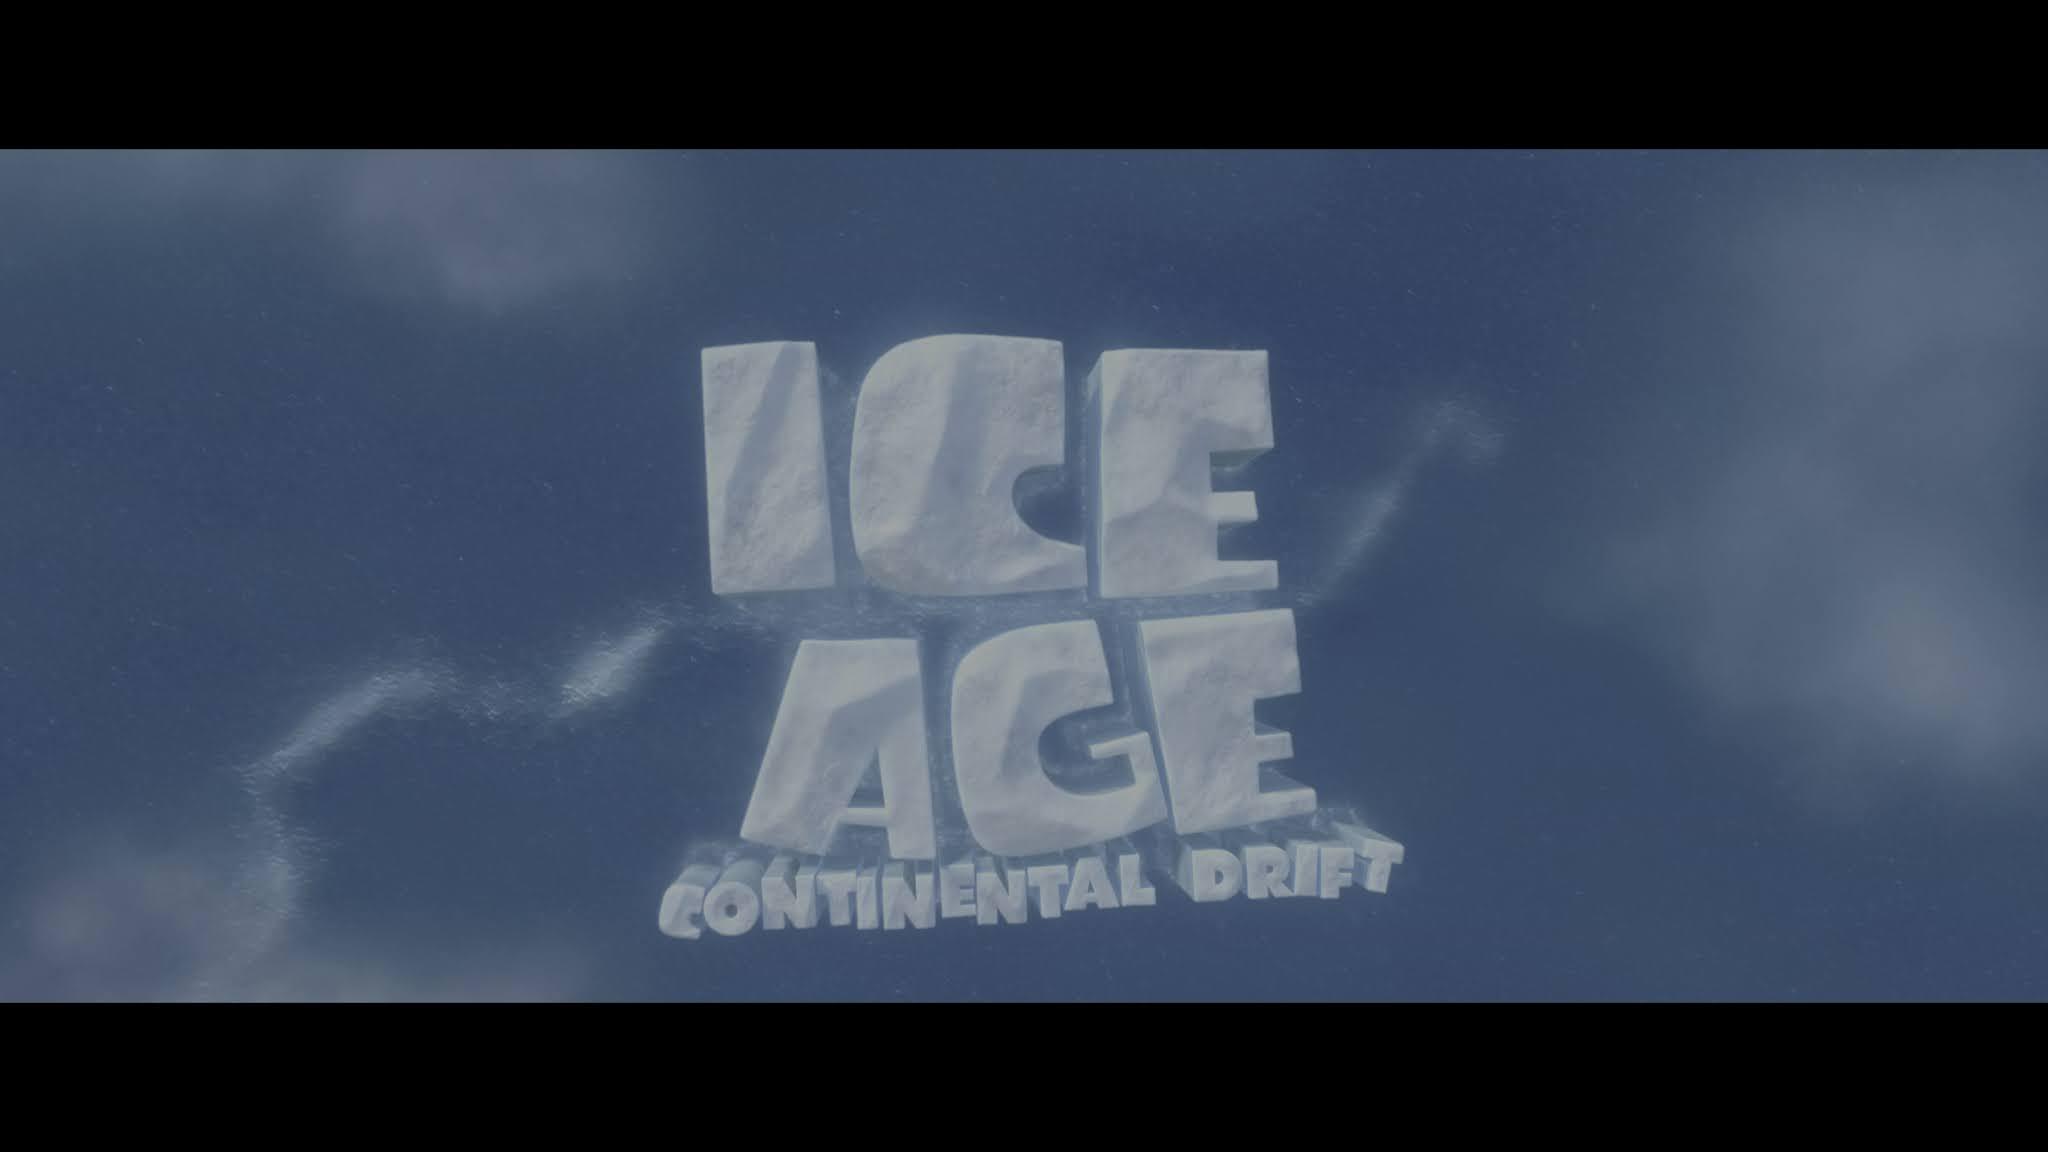 La era de hielo 4 (2012) 4K WEB-DL HDR Latino